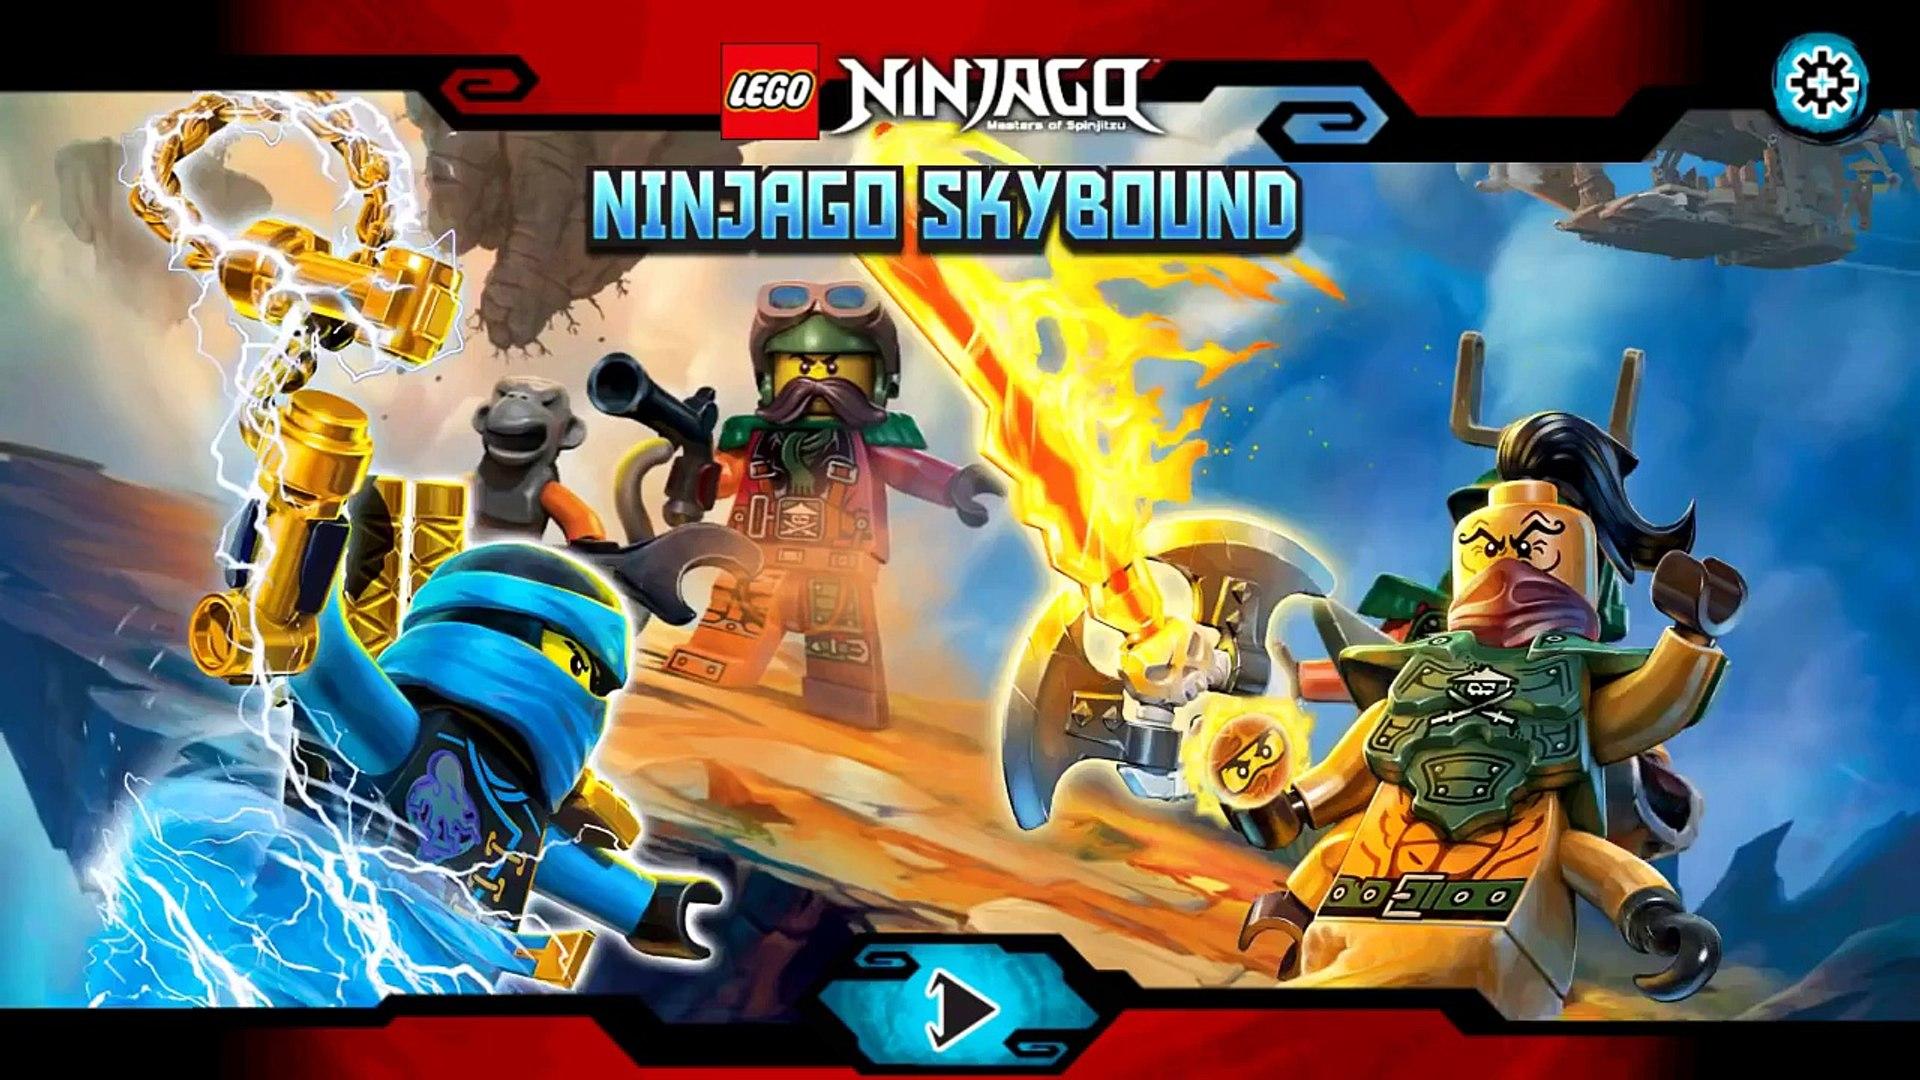 LEGO® Ninjago Skybound - Kid Friendly Android Games - Lego Ninjago Episode 1